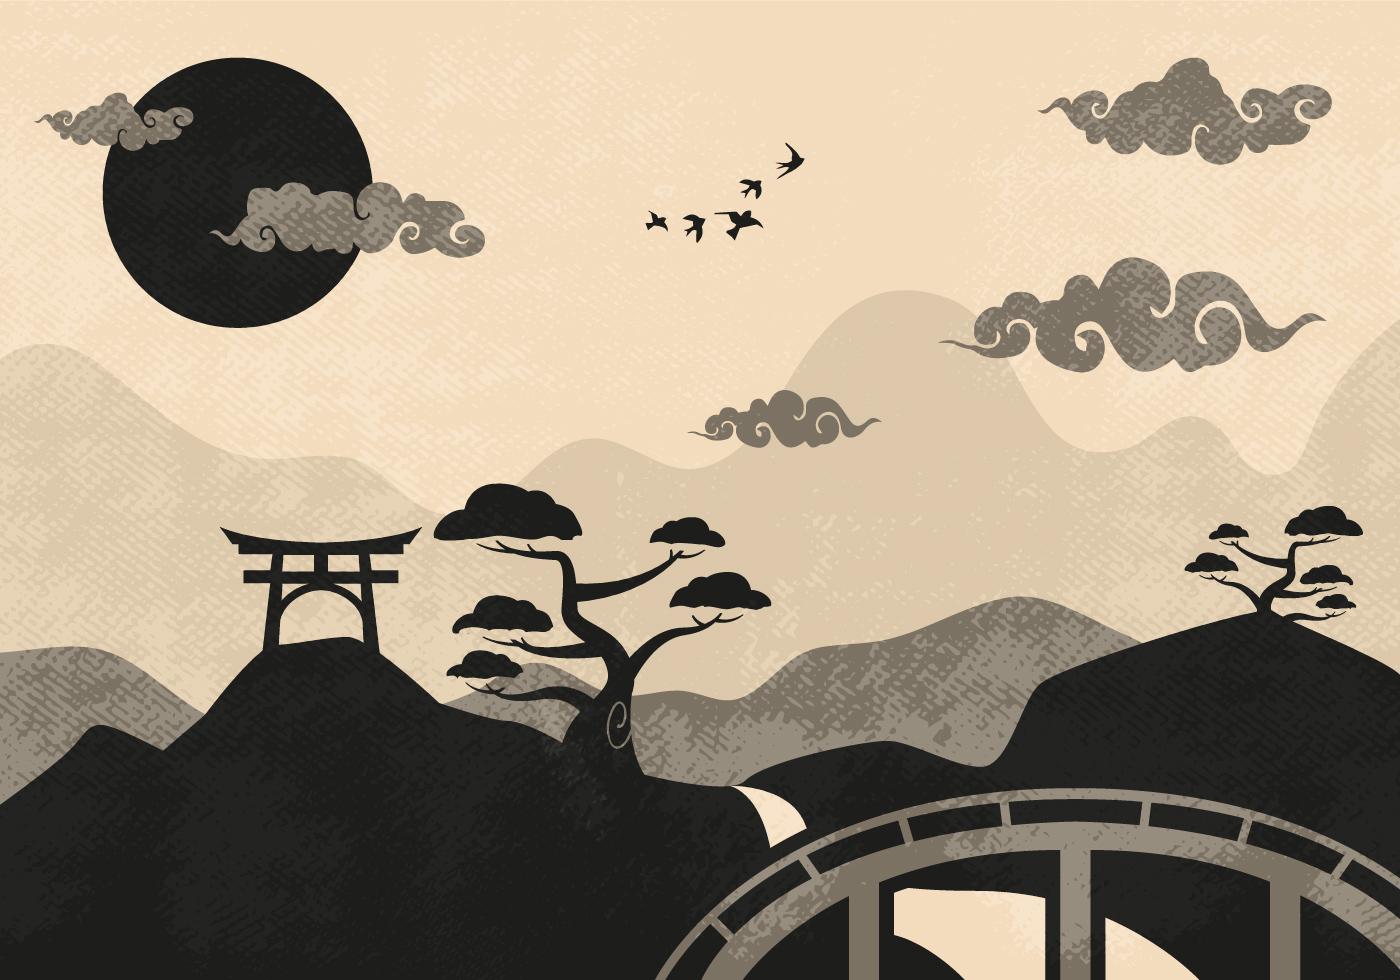 Landscape Illustration Vector Free: Chinese Clouds Landscape Illustration Vector